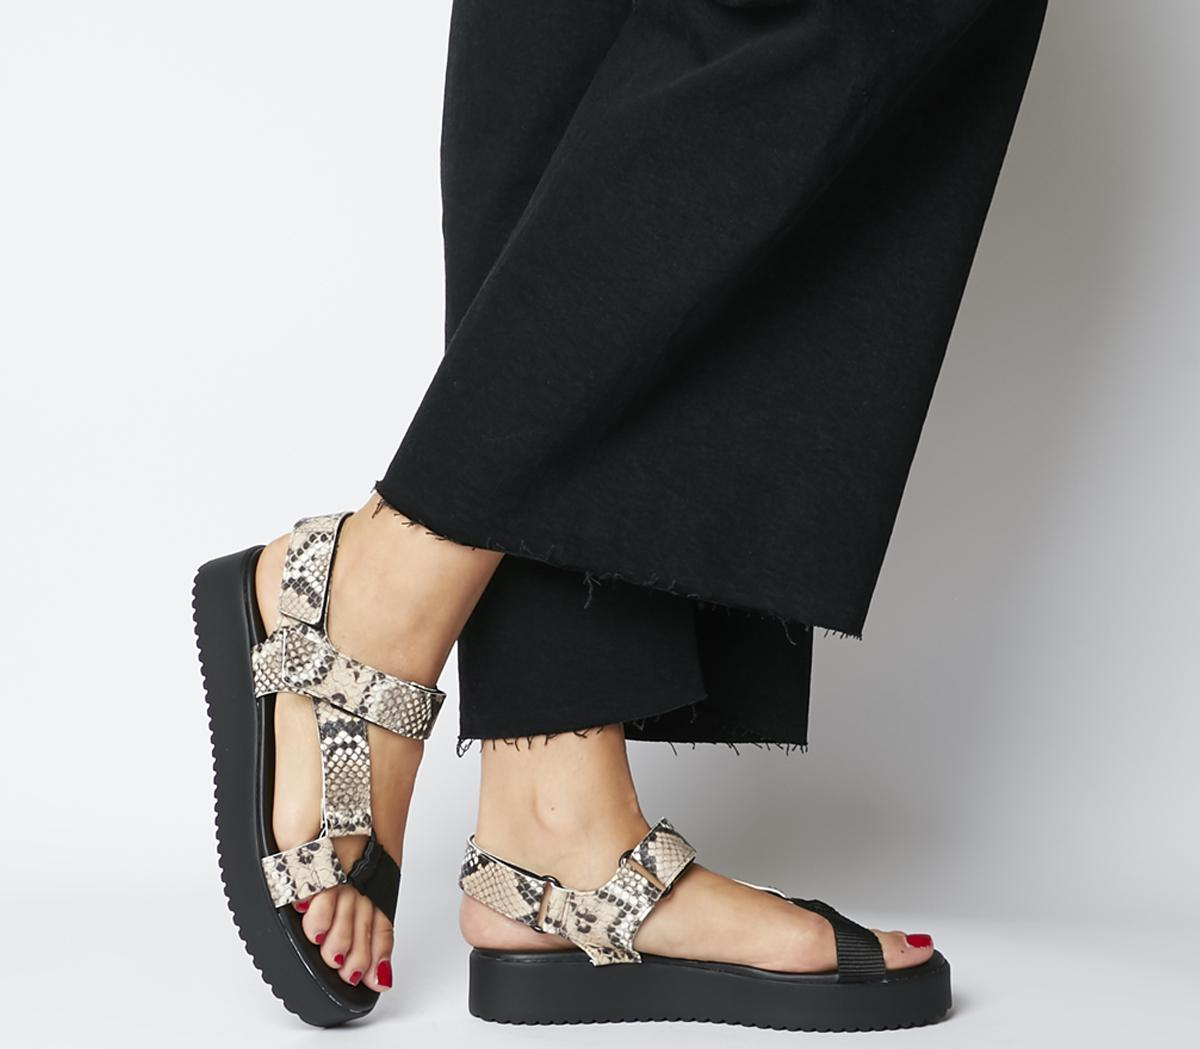 Sanity Sporty Strap Sandals